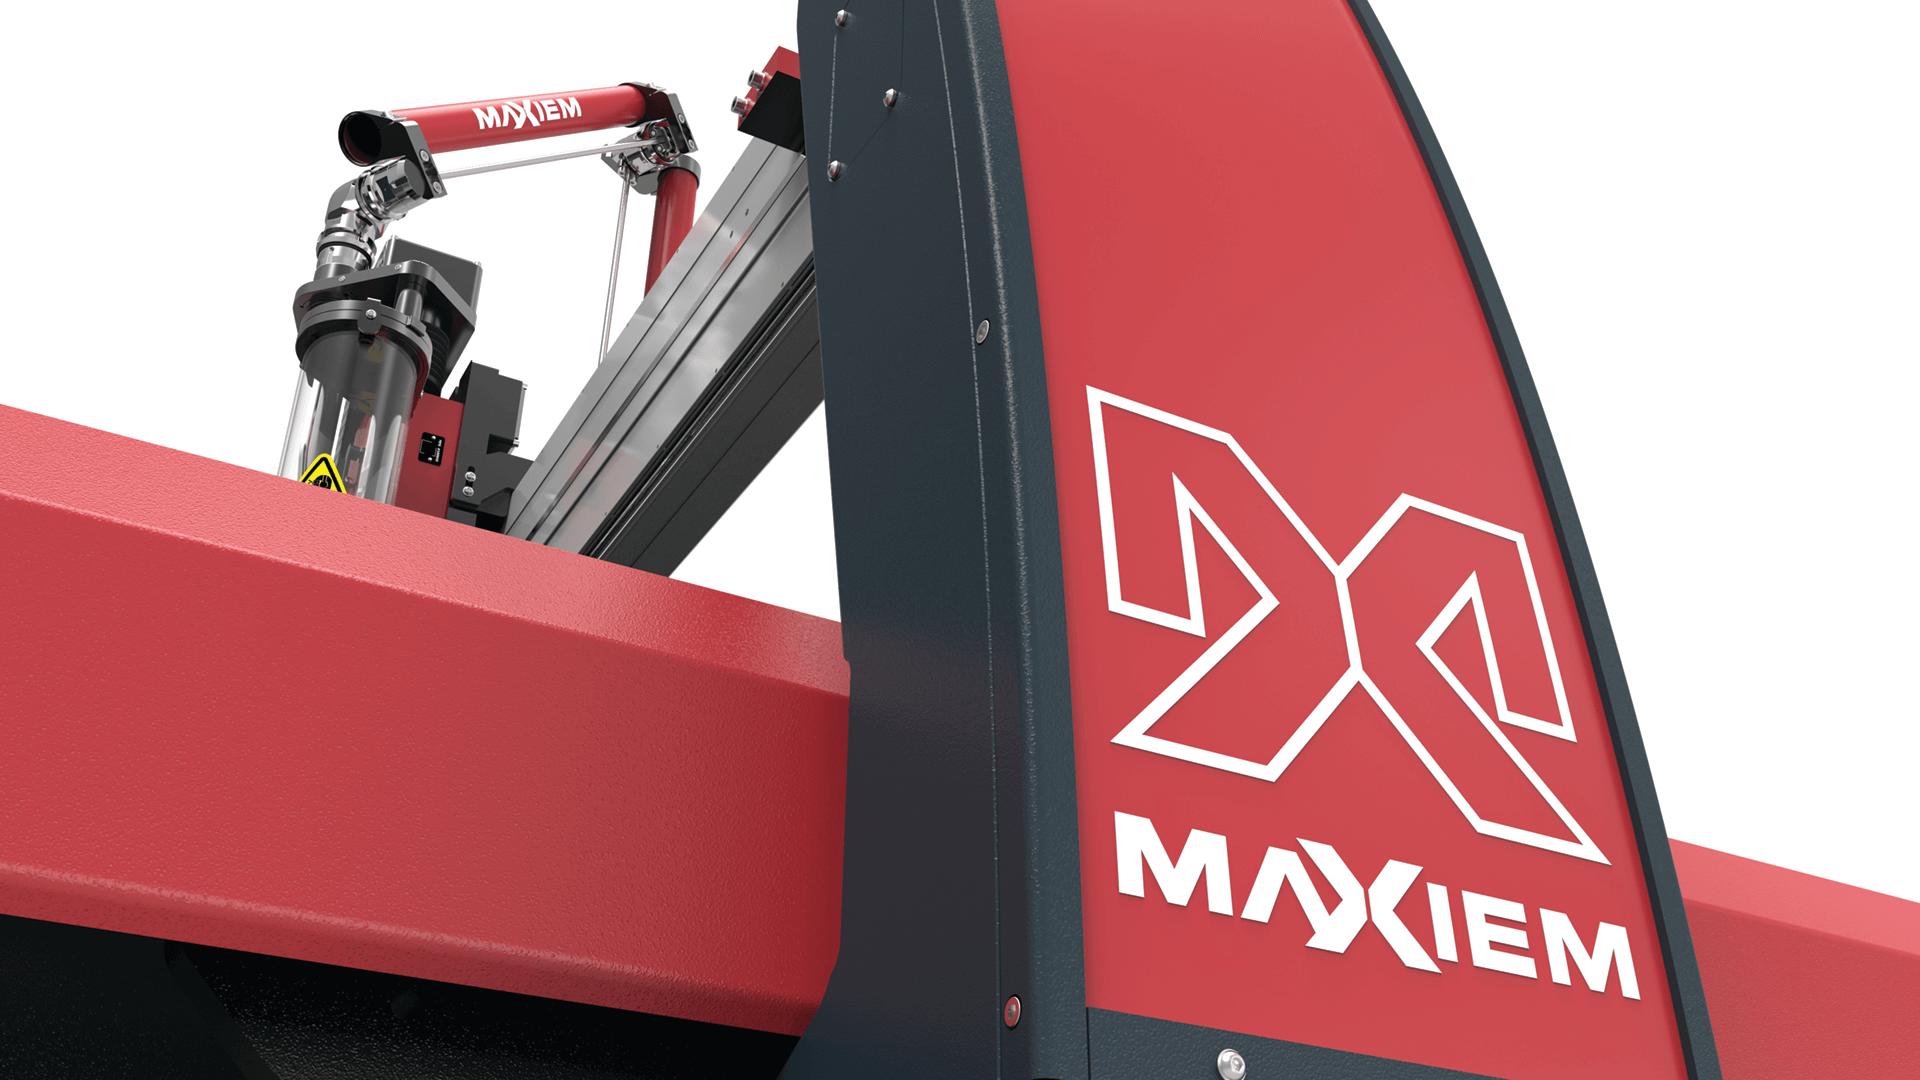 omax-maxiem-branding-machine-tower